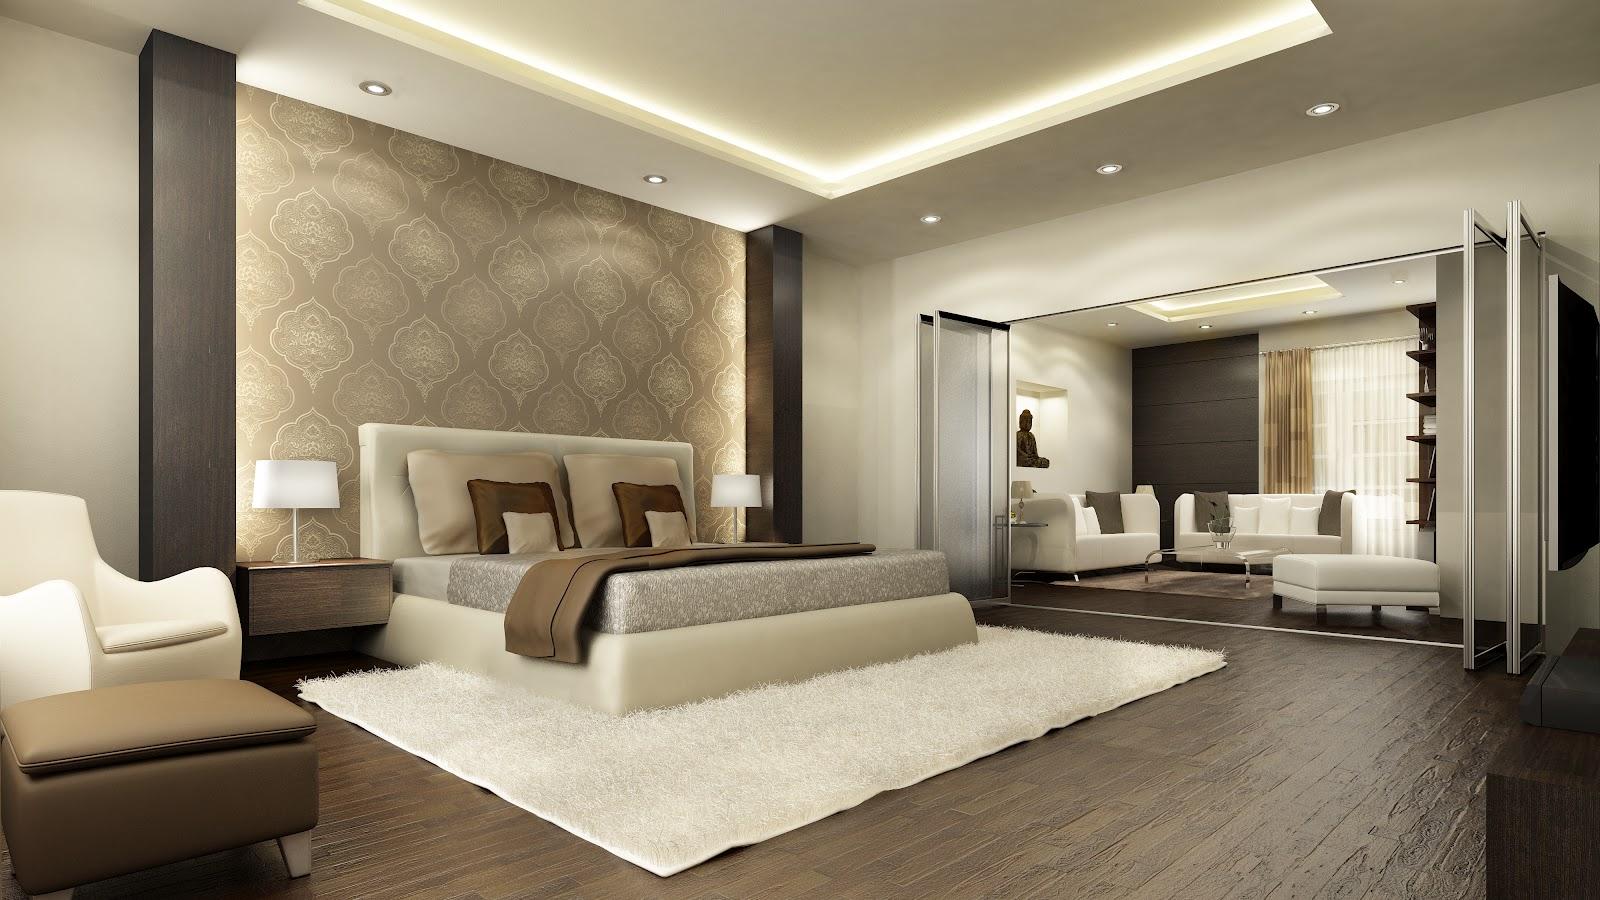 Bedroom Design Gallery For Inspiration